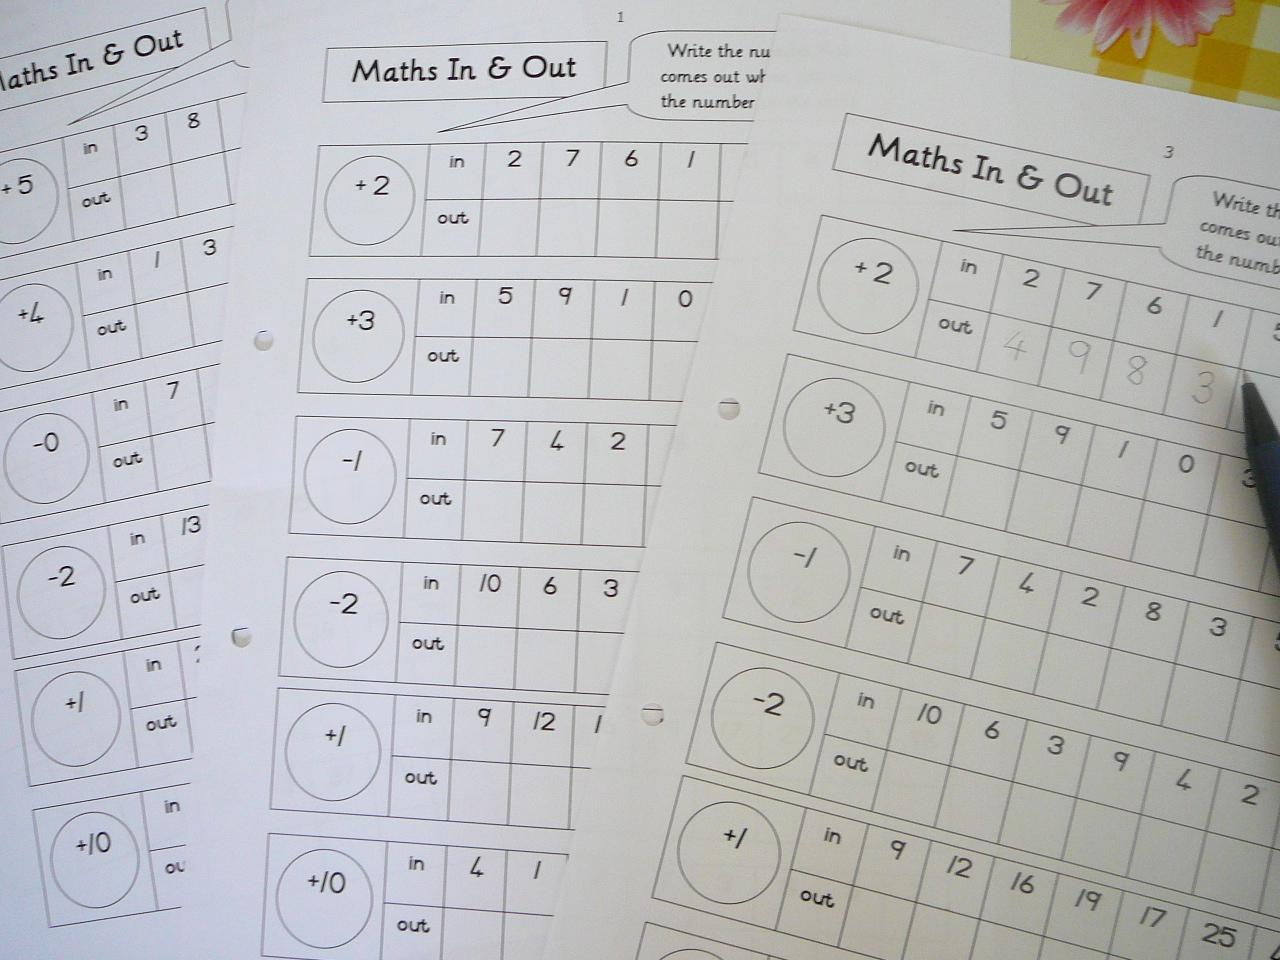 Mental Maths Practice fun worksheets – Remedial Math Worksheets